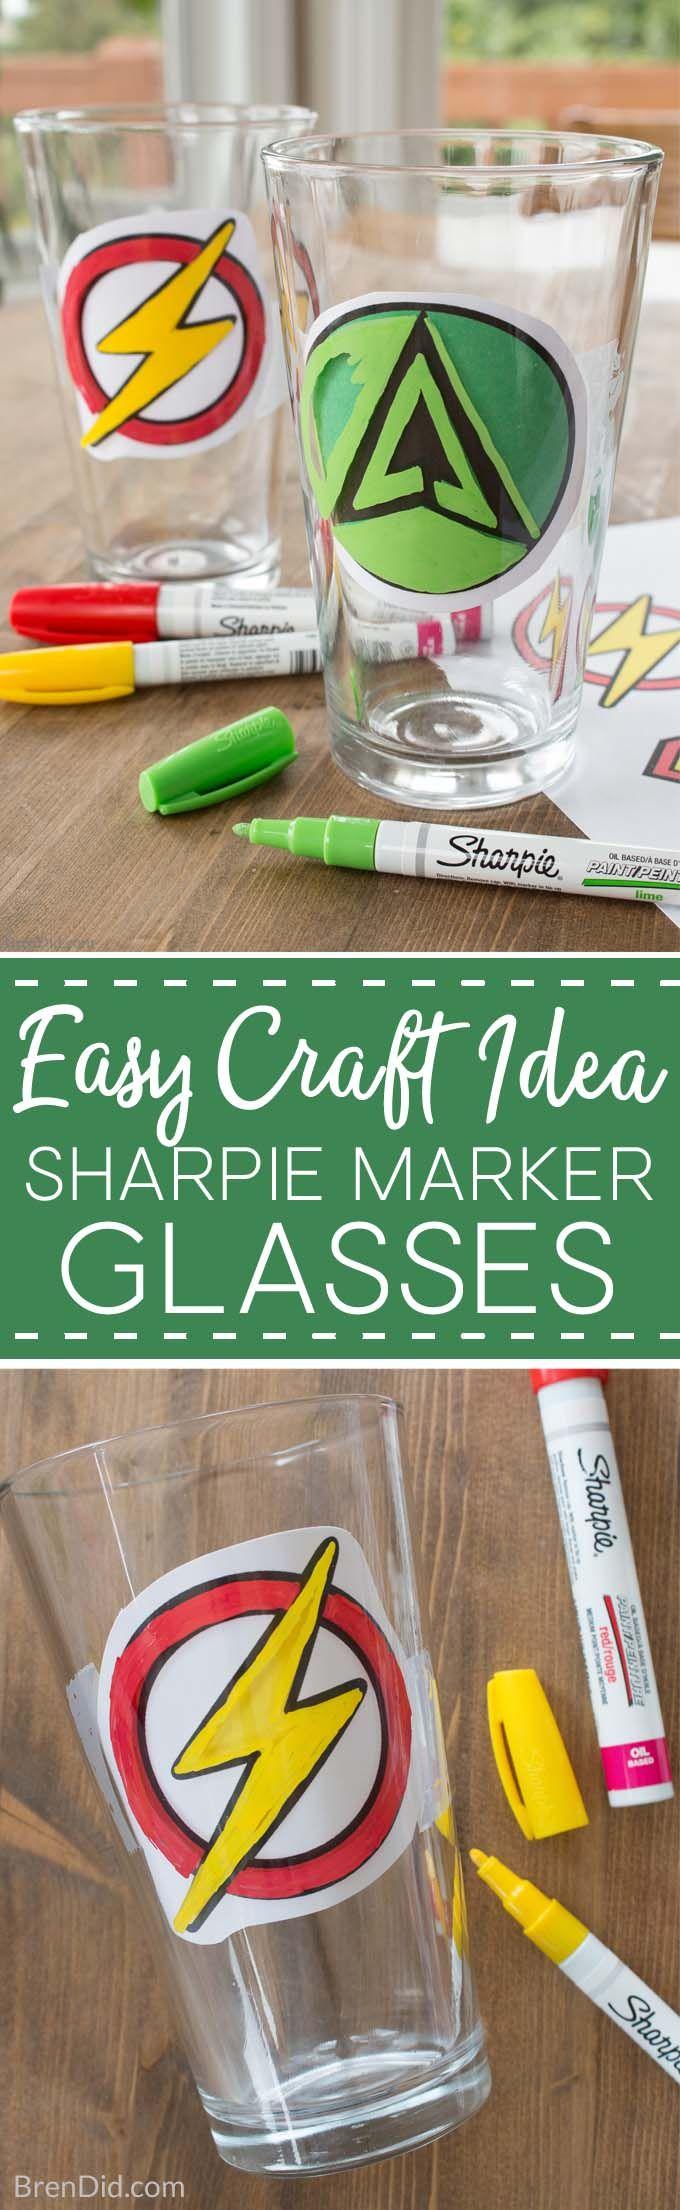 How to Make Custom DIY Sharpie Glasses, Sharpie glass diy, sharpie glassware, how to draw on glass with sharpie, sharpie art, sharpie crafts, superhero craft via @brendidblog